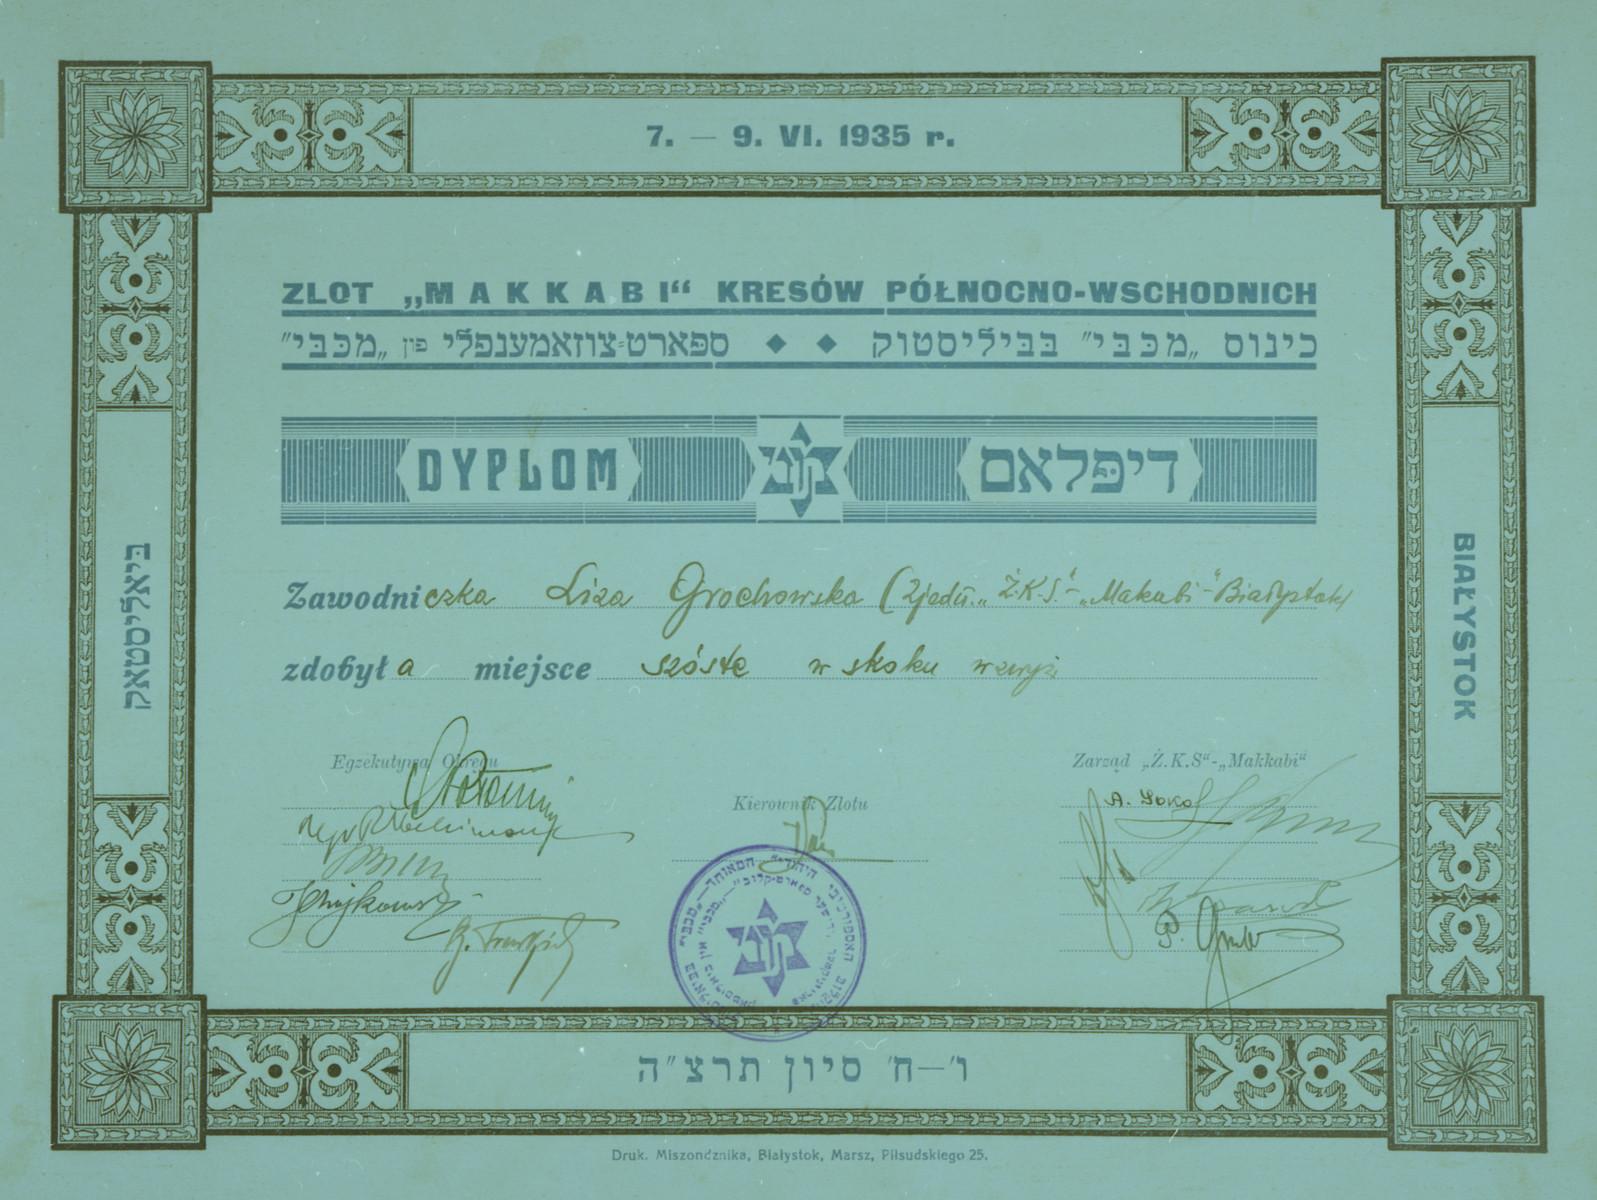 Maccabi certificate issued to Liza Grochowska.